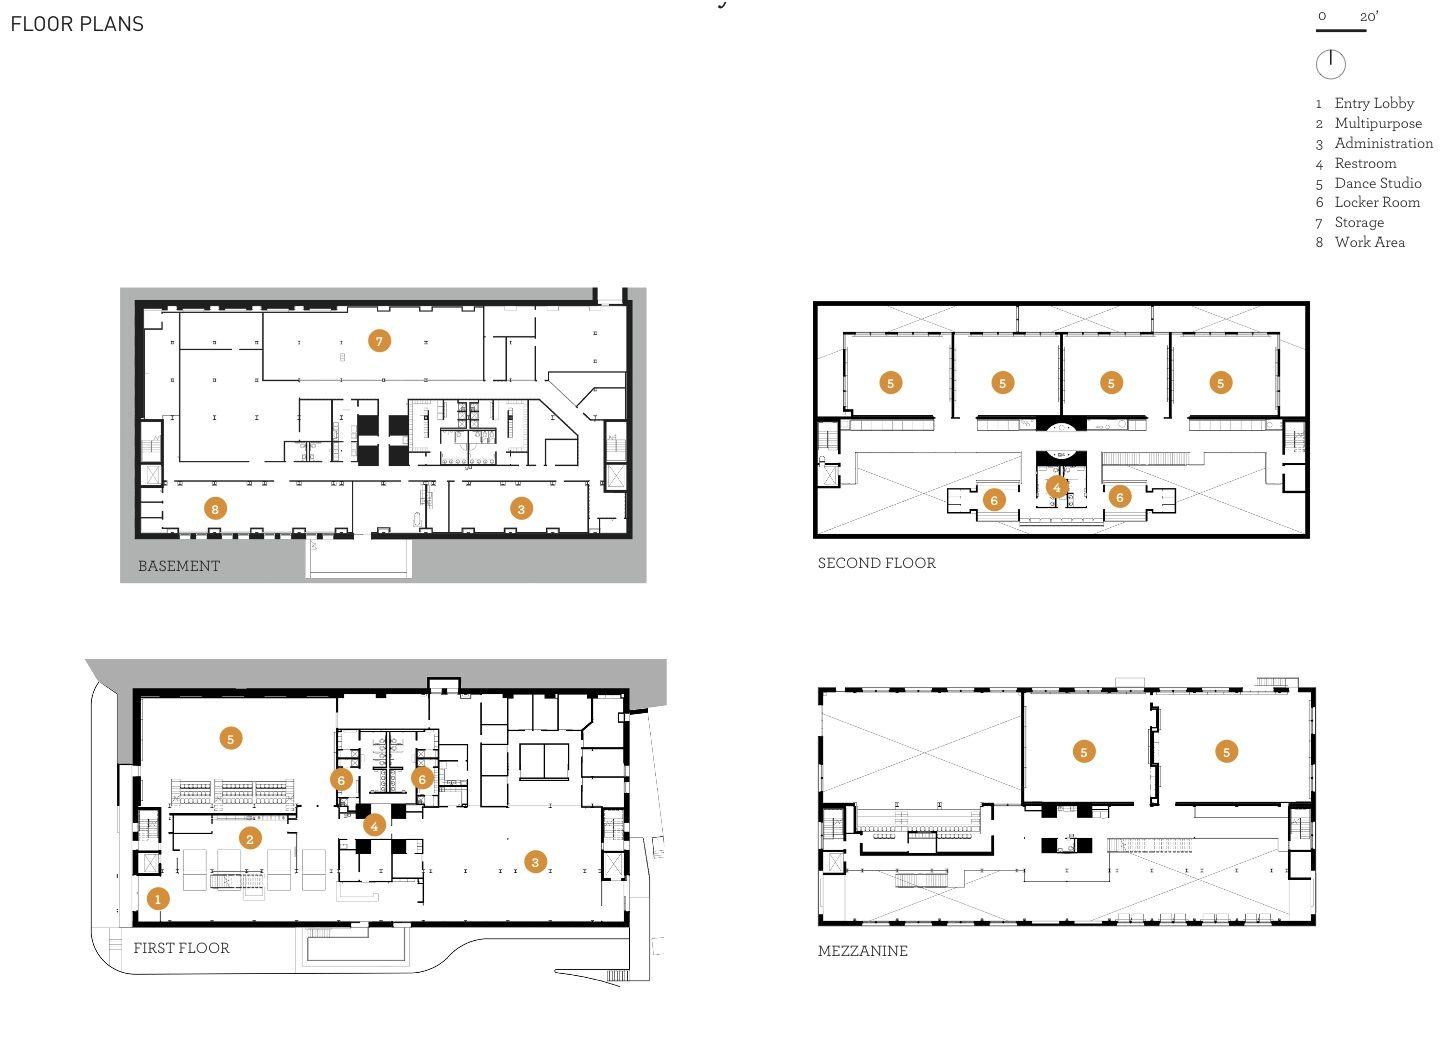 100 mezzanine floor plan house thesis a boutique hotel by shelley quinn at coroflot com - Studio plan met mezzanine ...